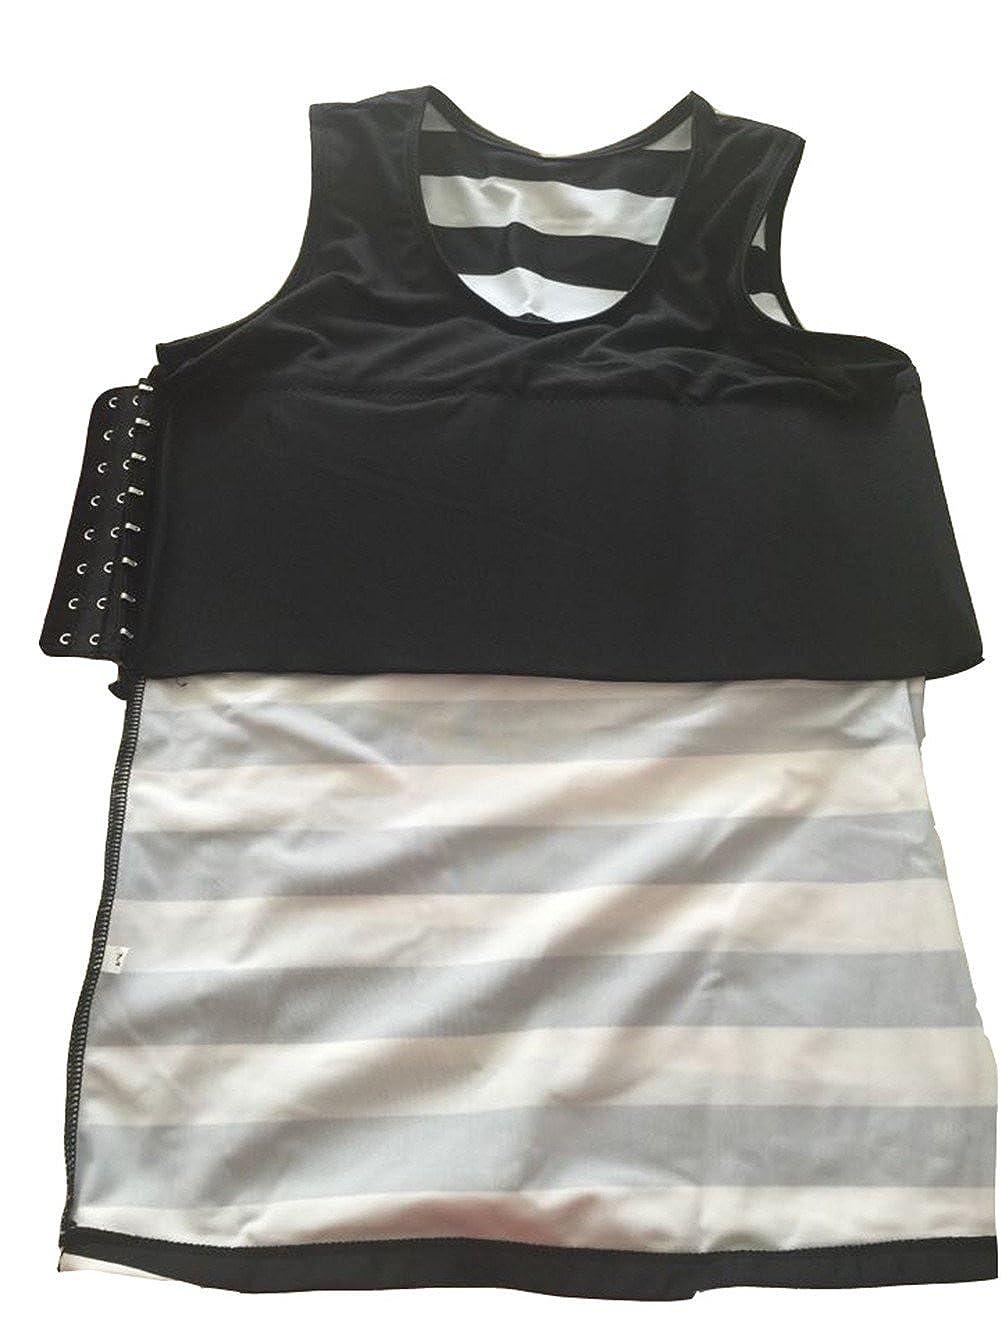 Super Flat Les Lesbian Tomboy Compression Clasp Chest Binder Swimsuit Top Trunk